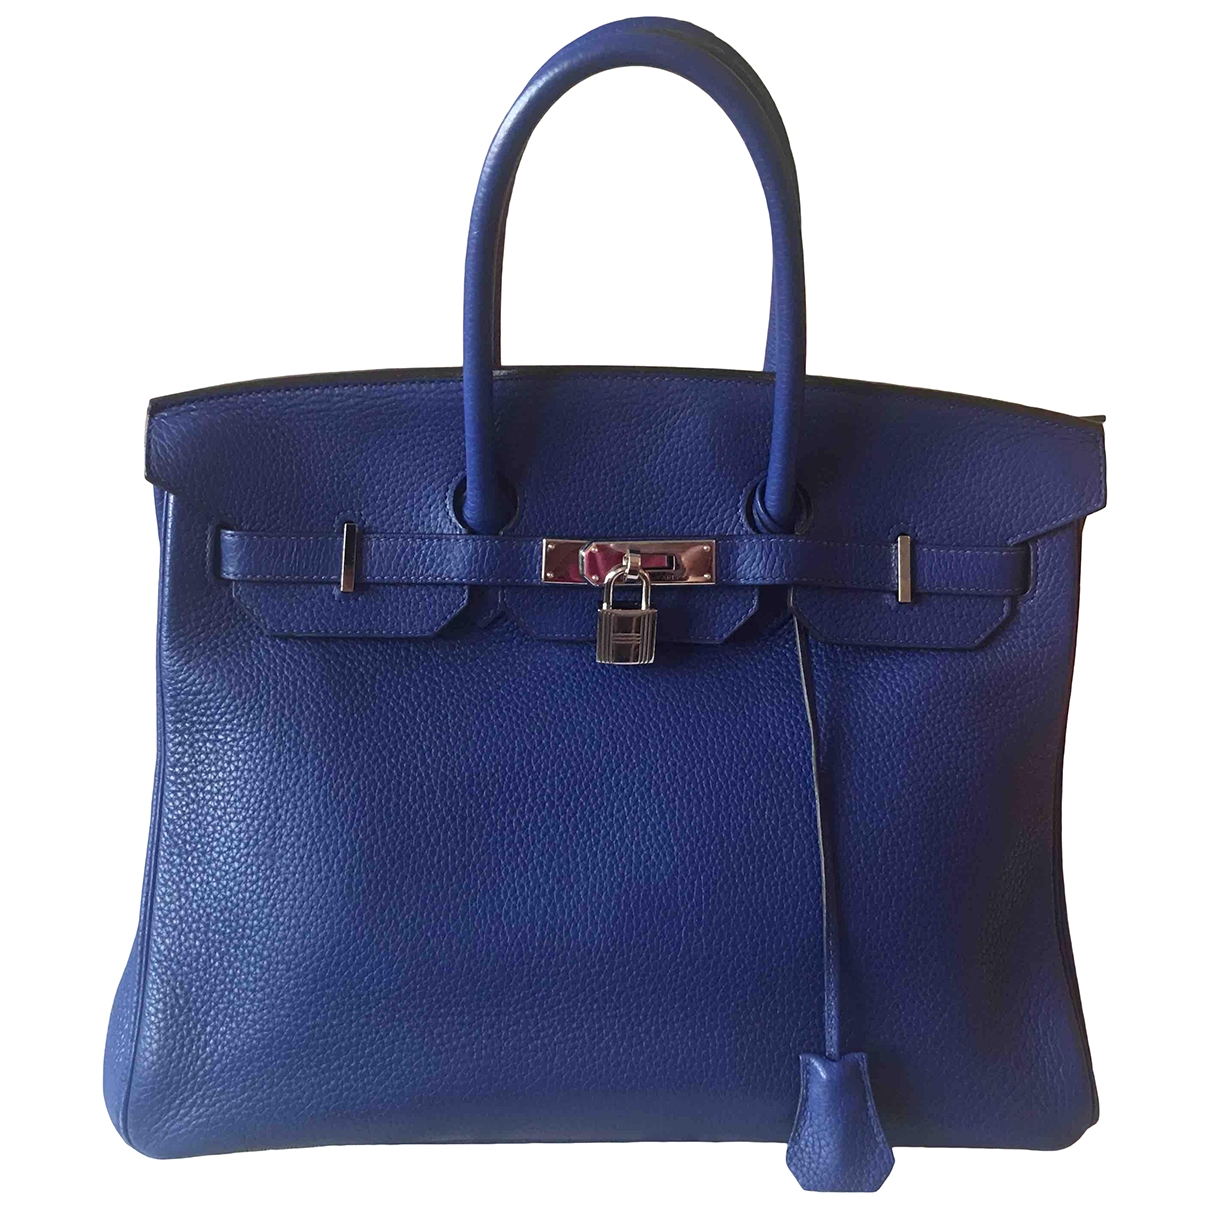 Hermes - Sac a main Birkin 35 pour femme en cuir - bleu